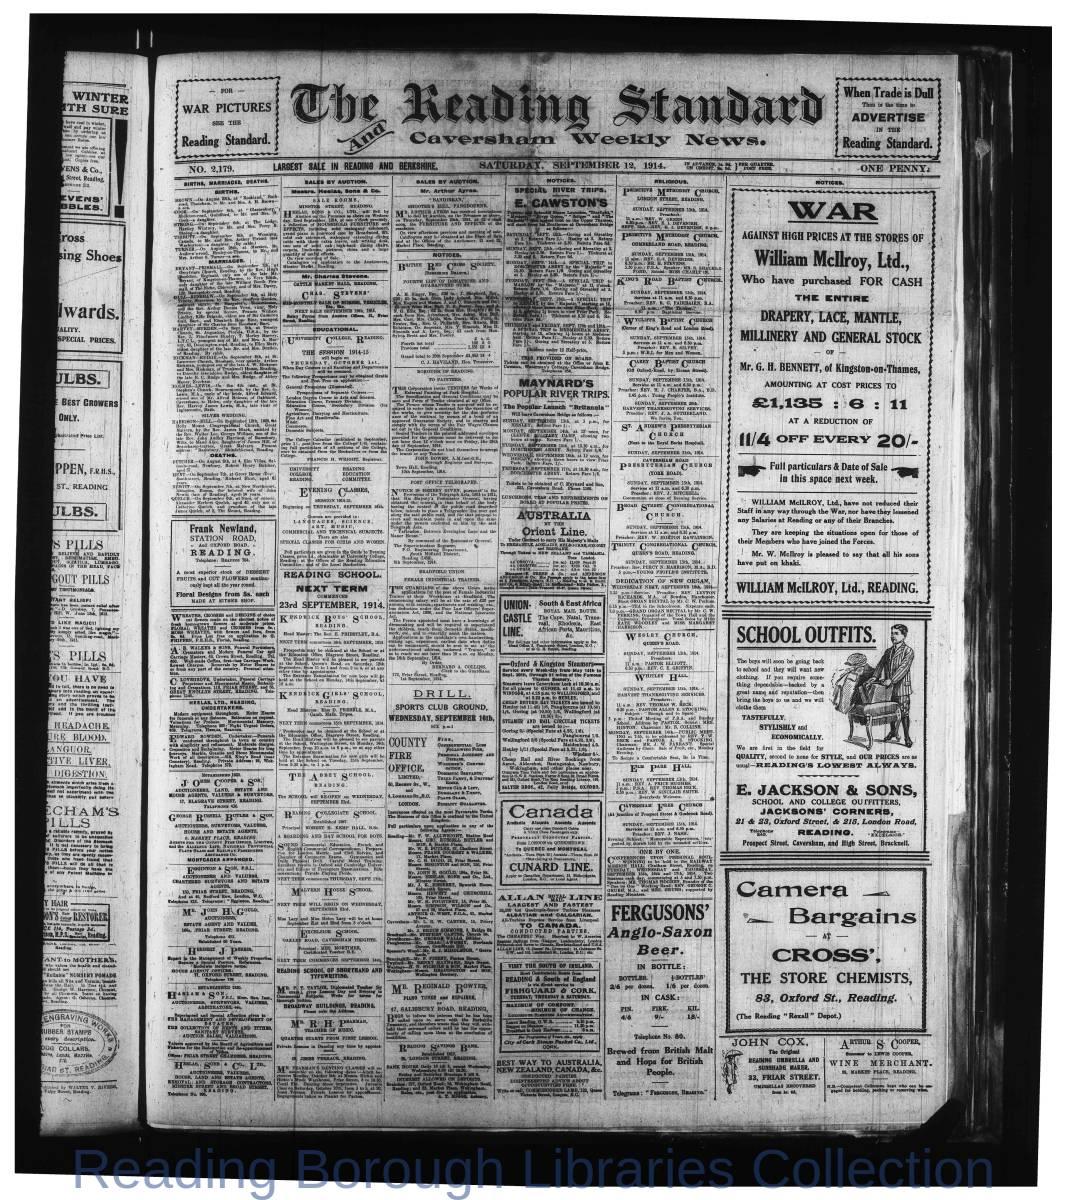 Reading Standard, Saturday, September 12,  1914. Pg 1